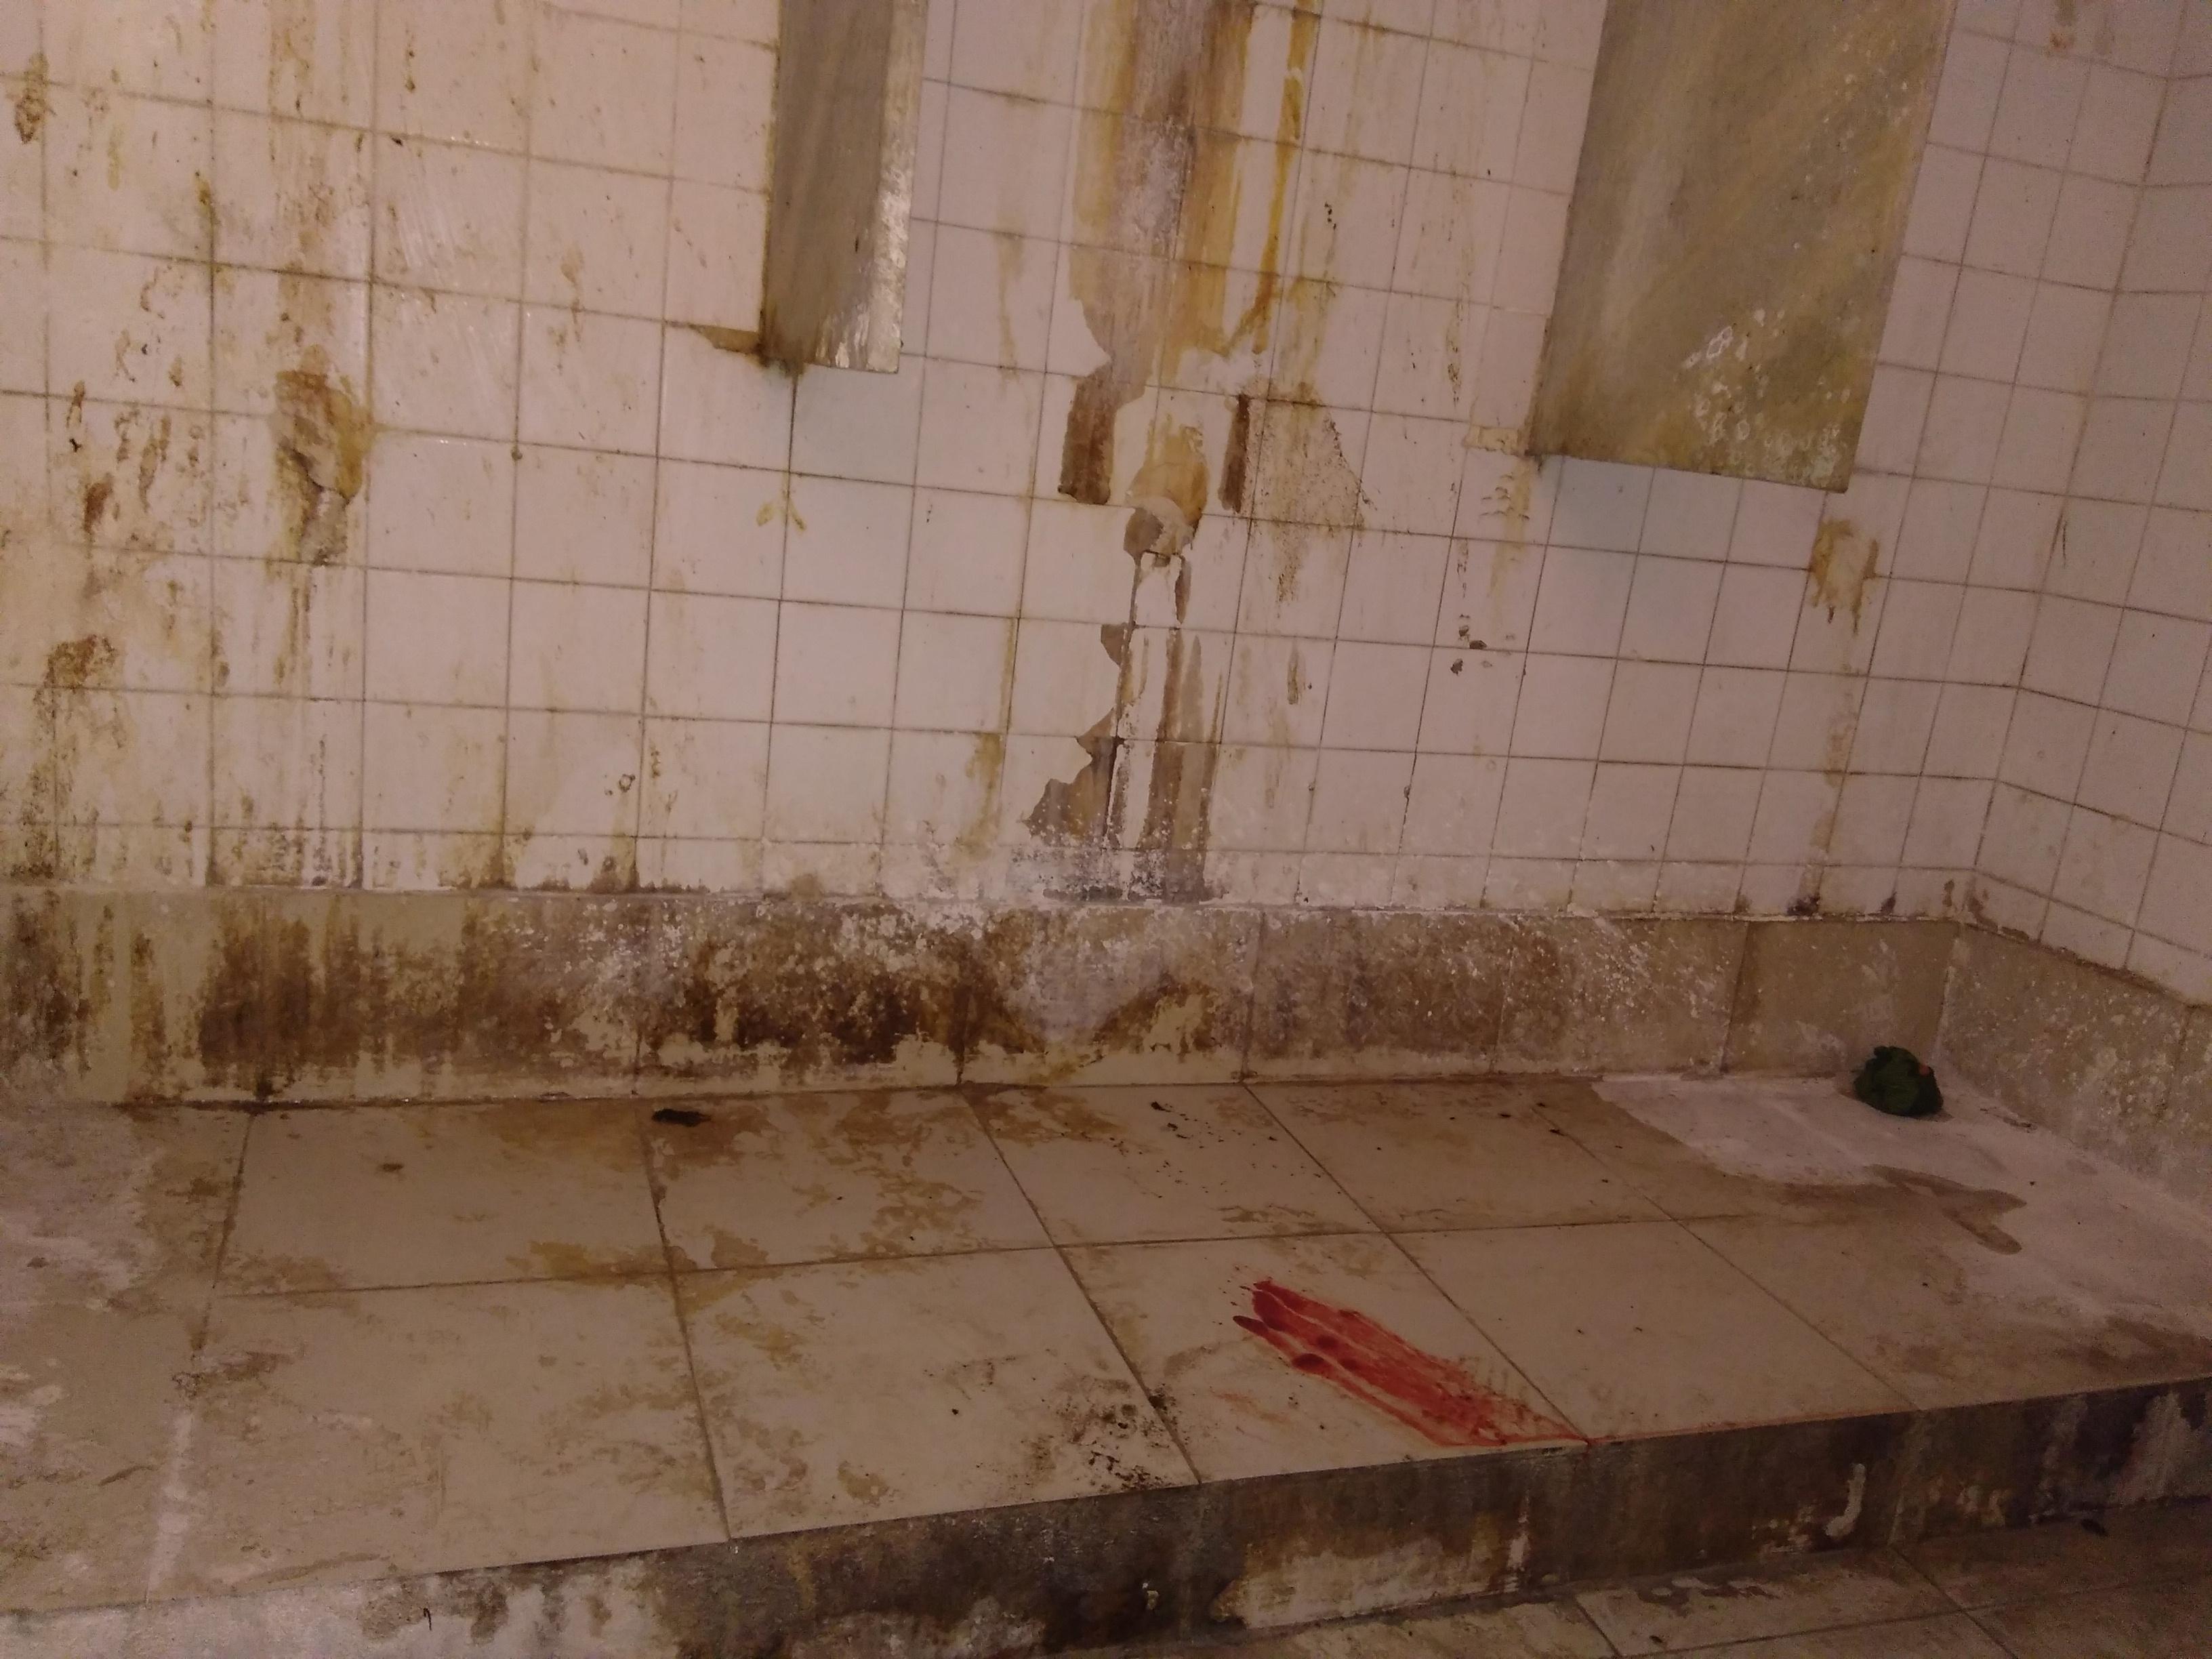 आईजीआईएमएस स्थित शौचालय